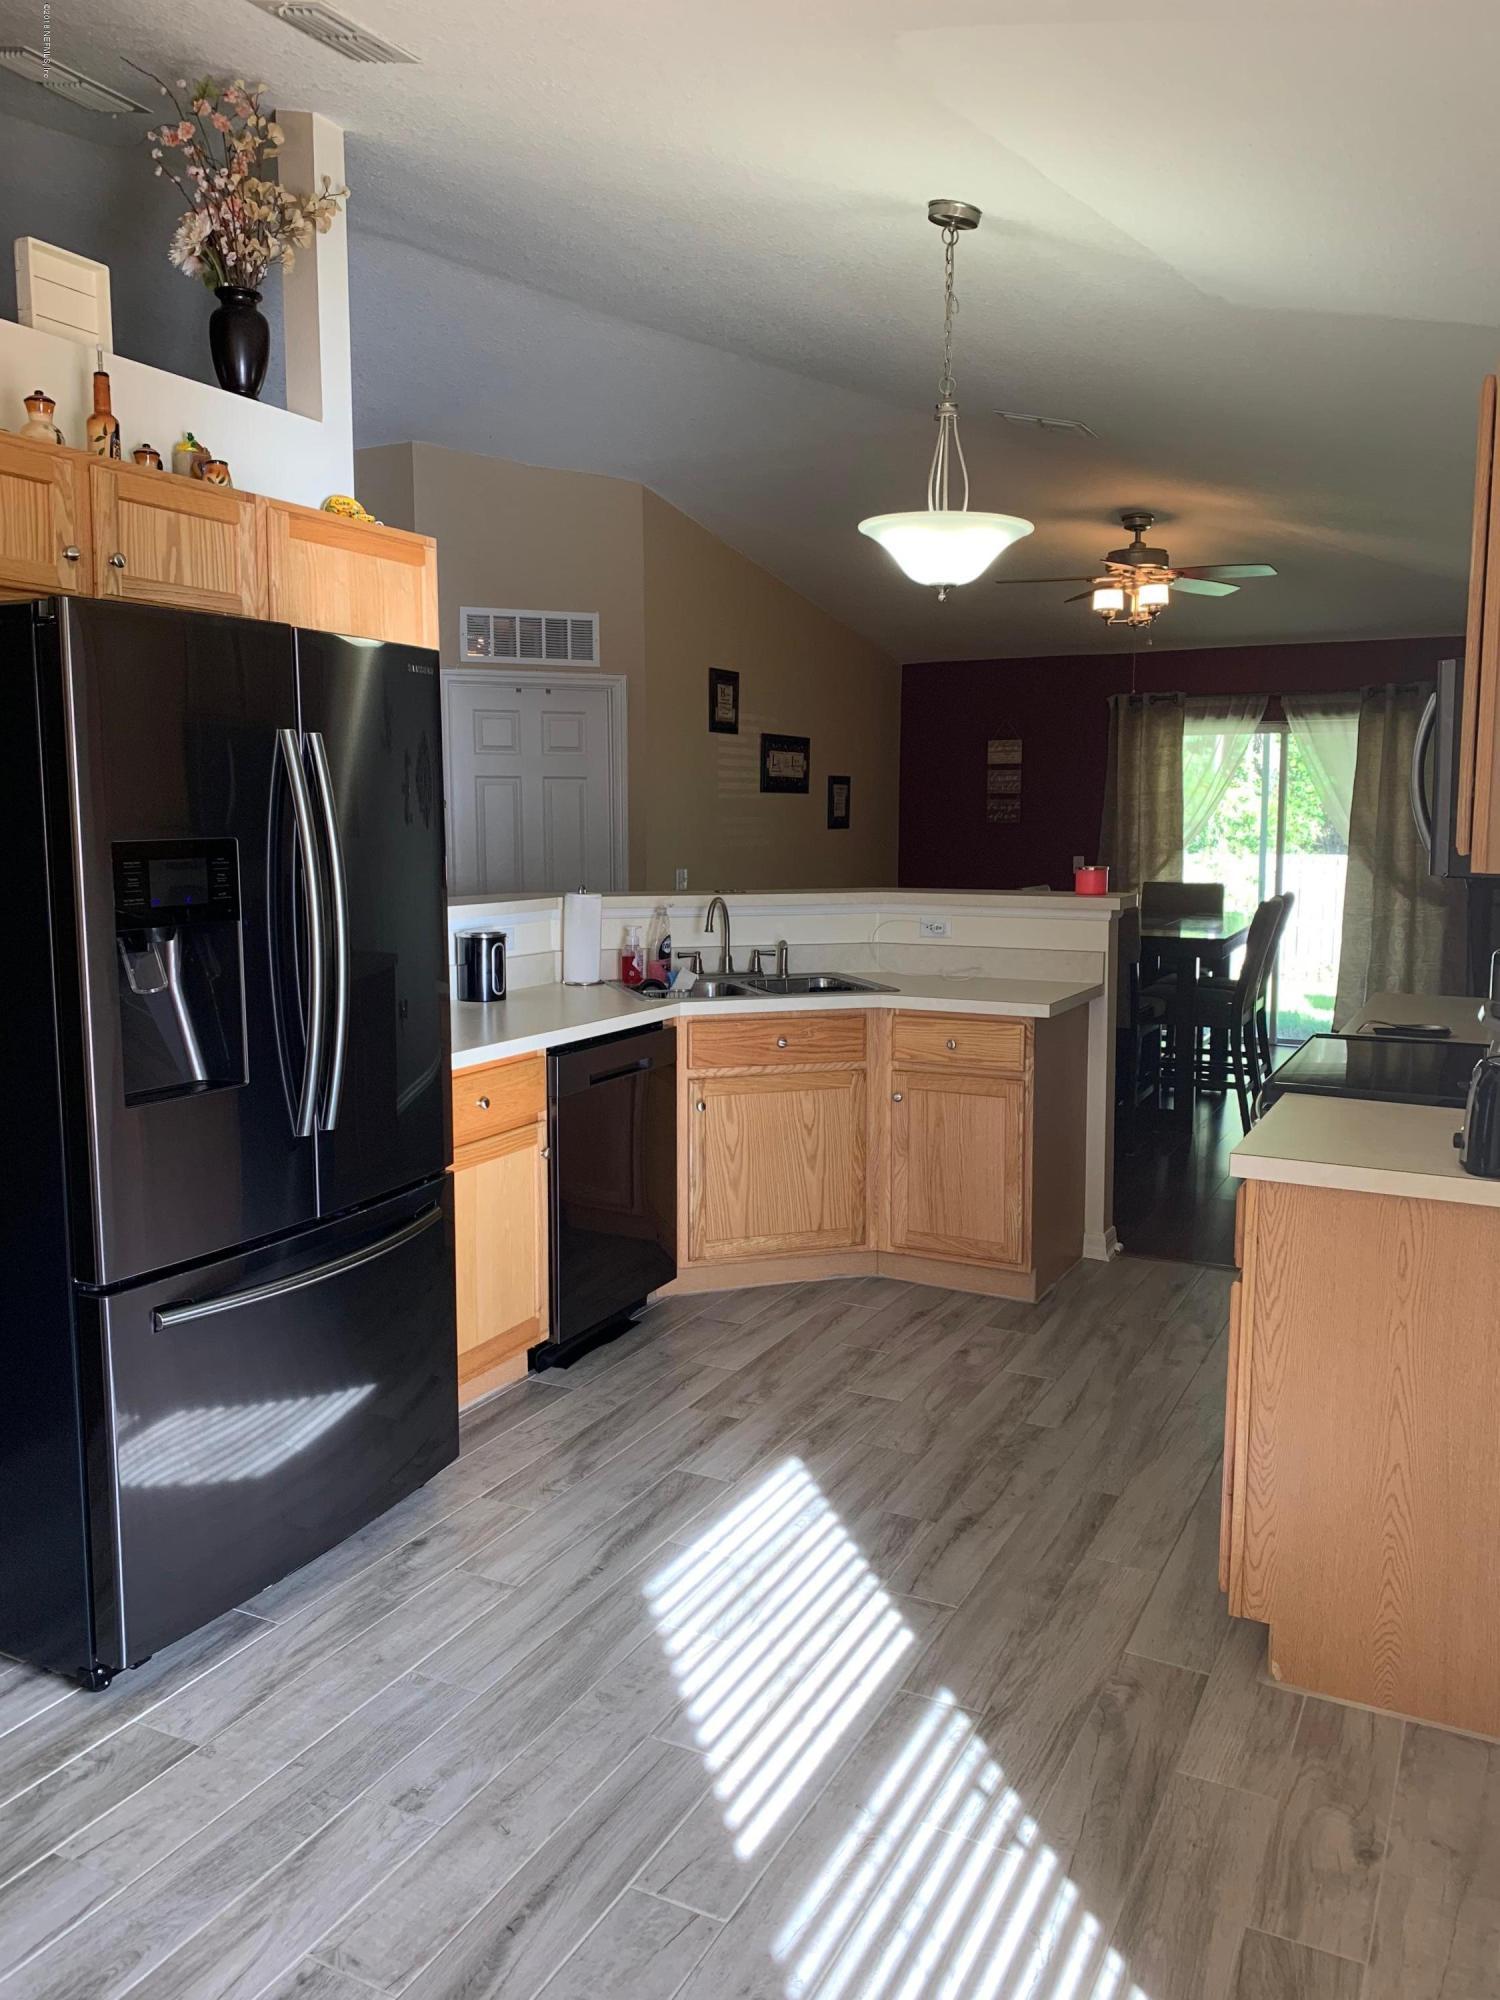 4431 SPARROW HAWK, JACKSONVILLE, FLORIDA 32210, 3 Bedrooms Bedrooms, ,2 BathroomsBathrooms,Residential - single family,For sale,SPARROW HAWK,965476